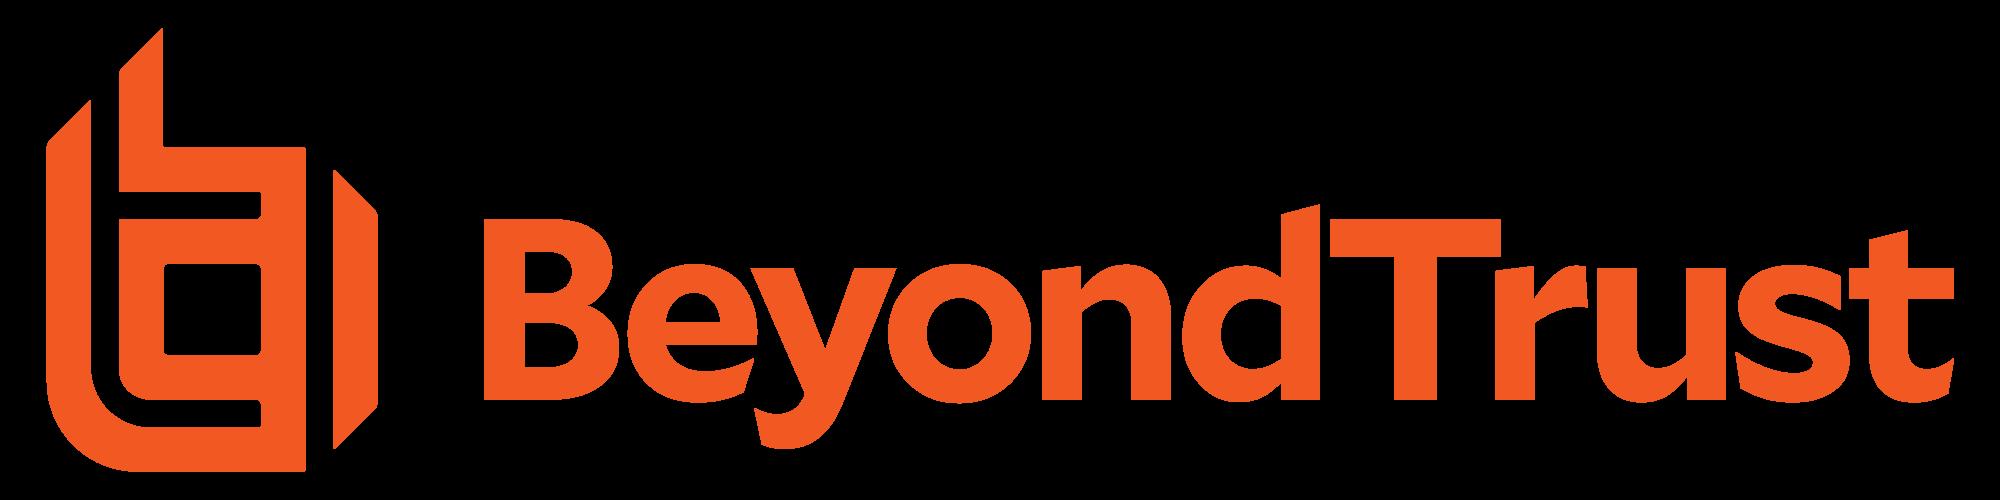 logo-beyondtrust